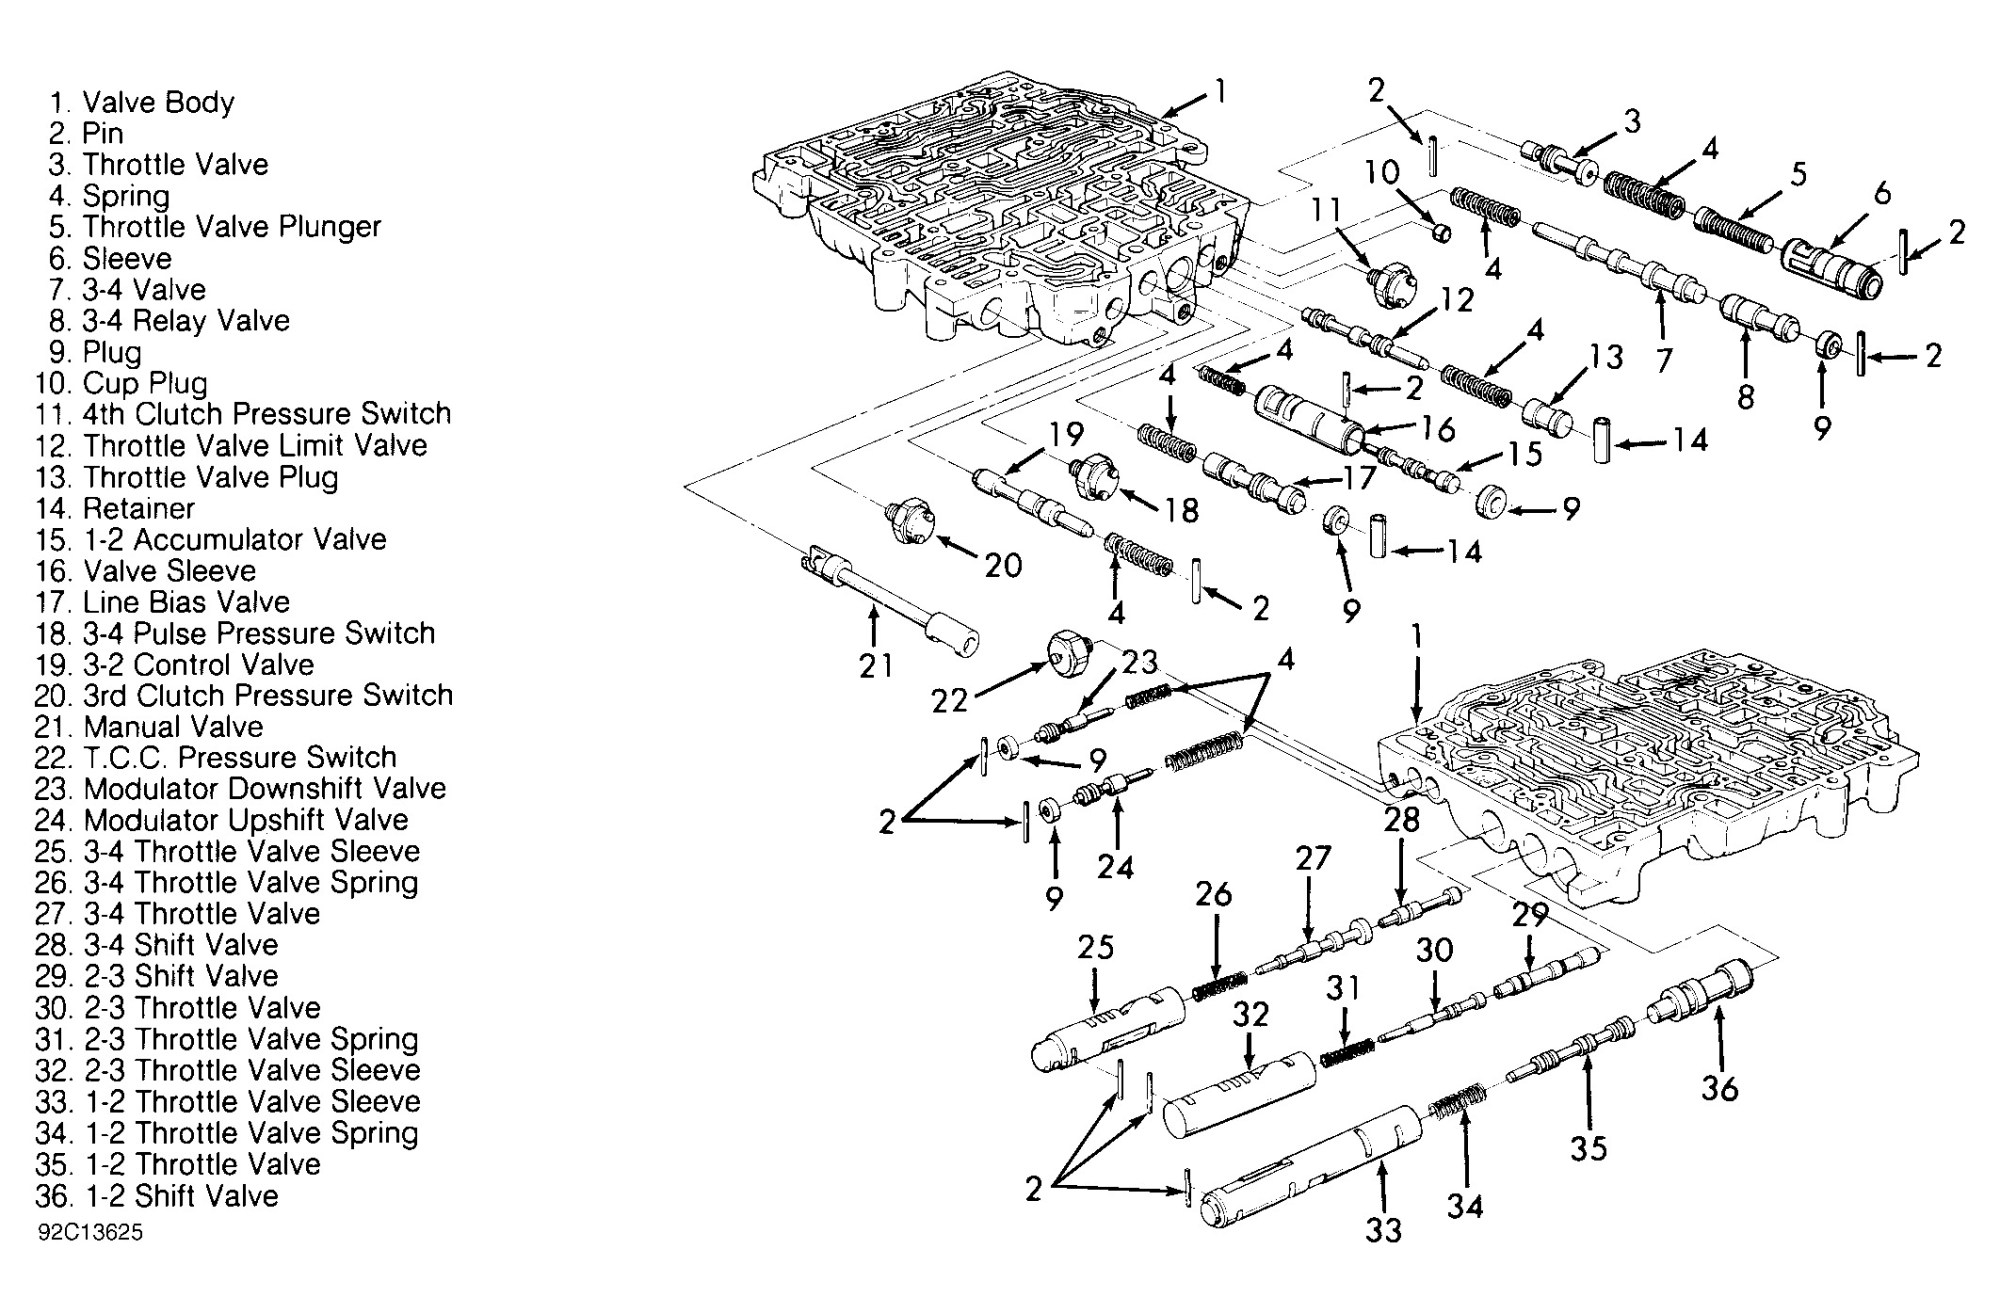 hight resolution of th350 valve body diagram